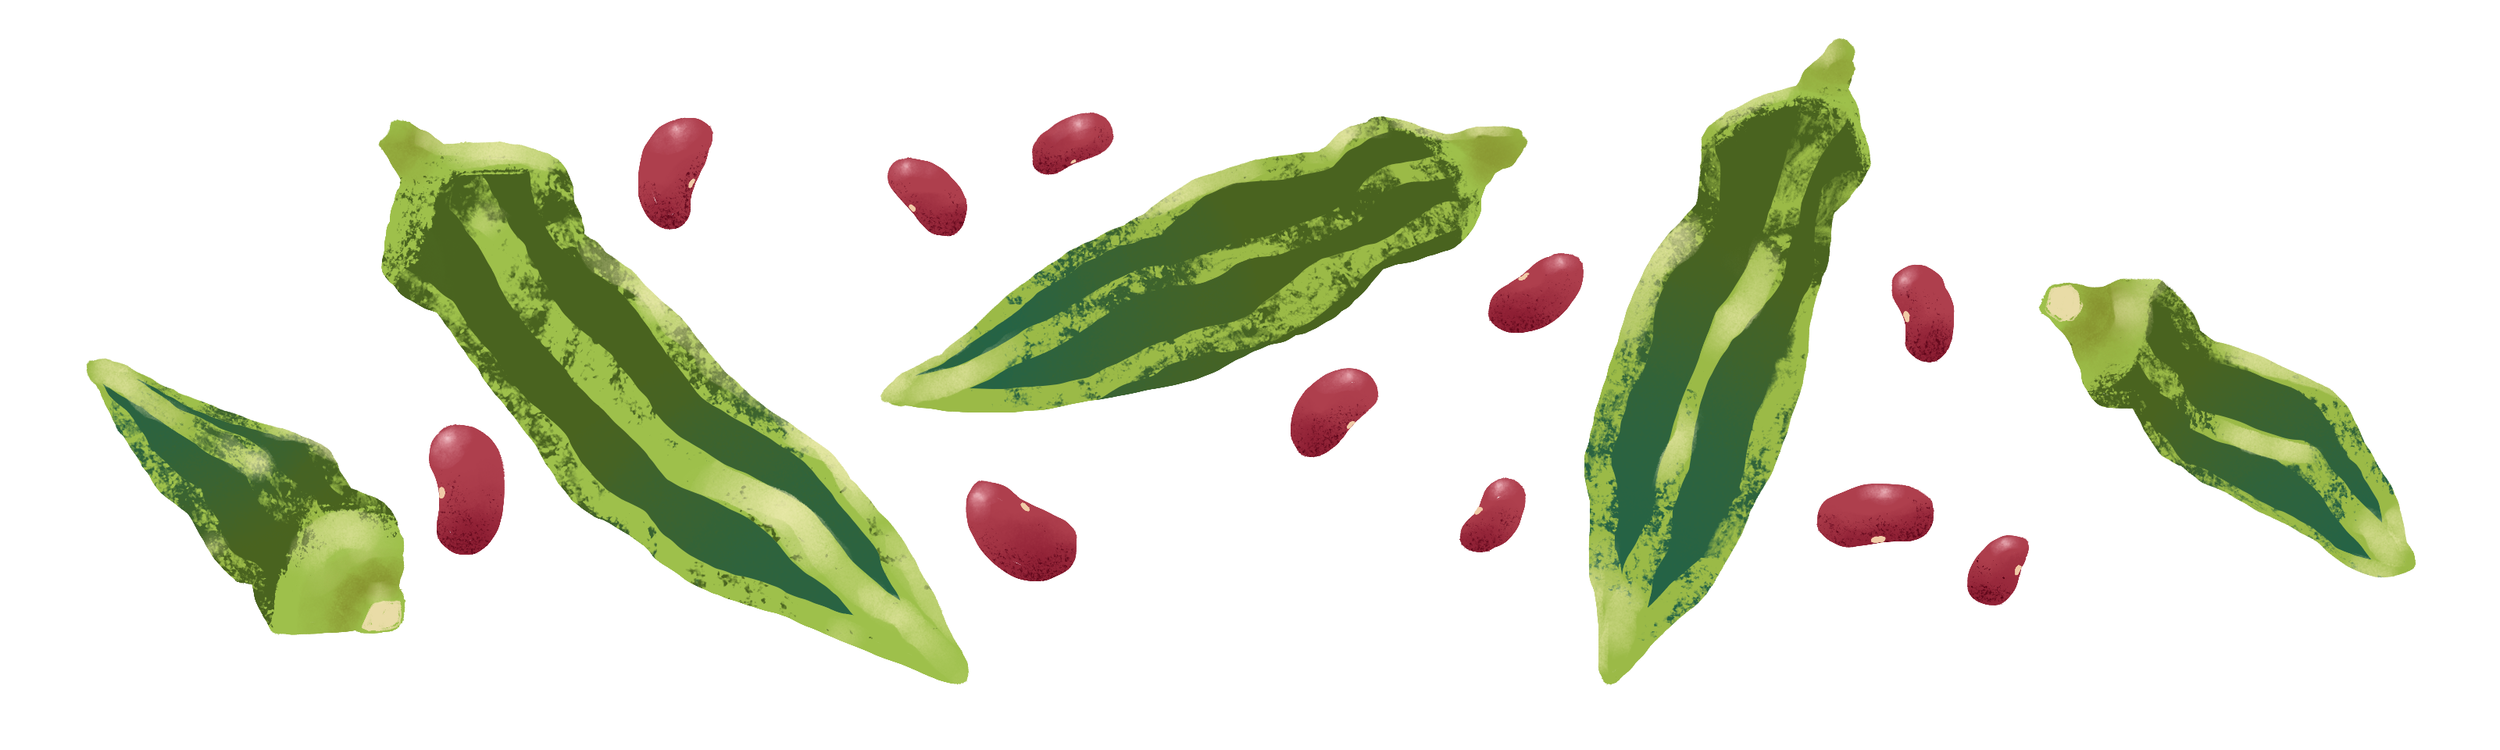 PureMichigan_Beans+Greens_060518.png